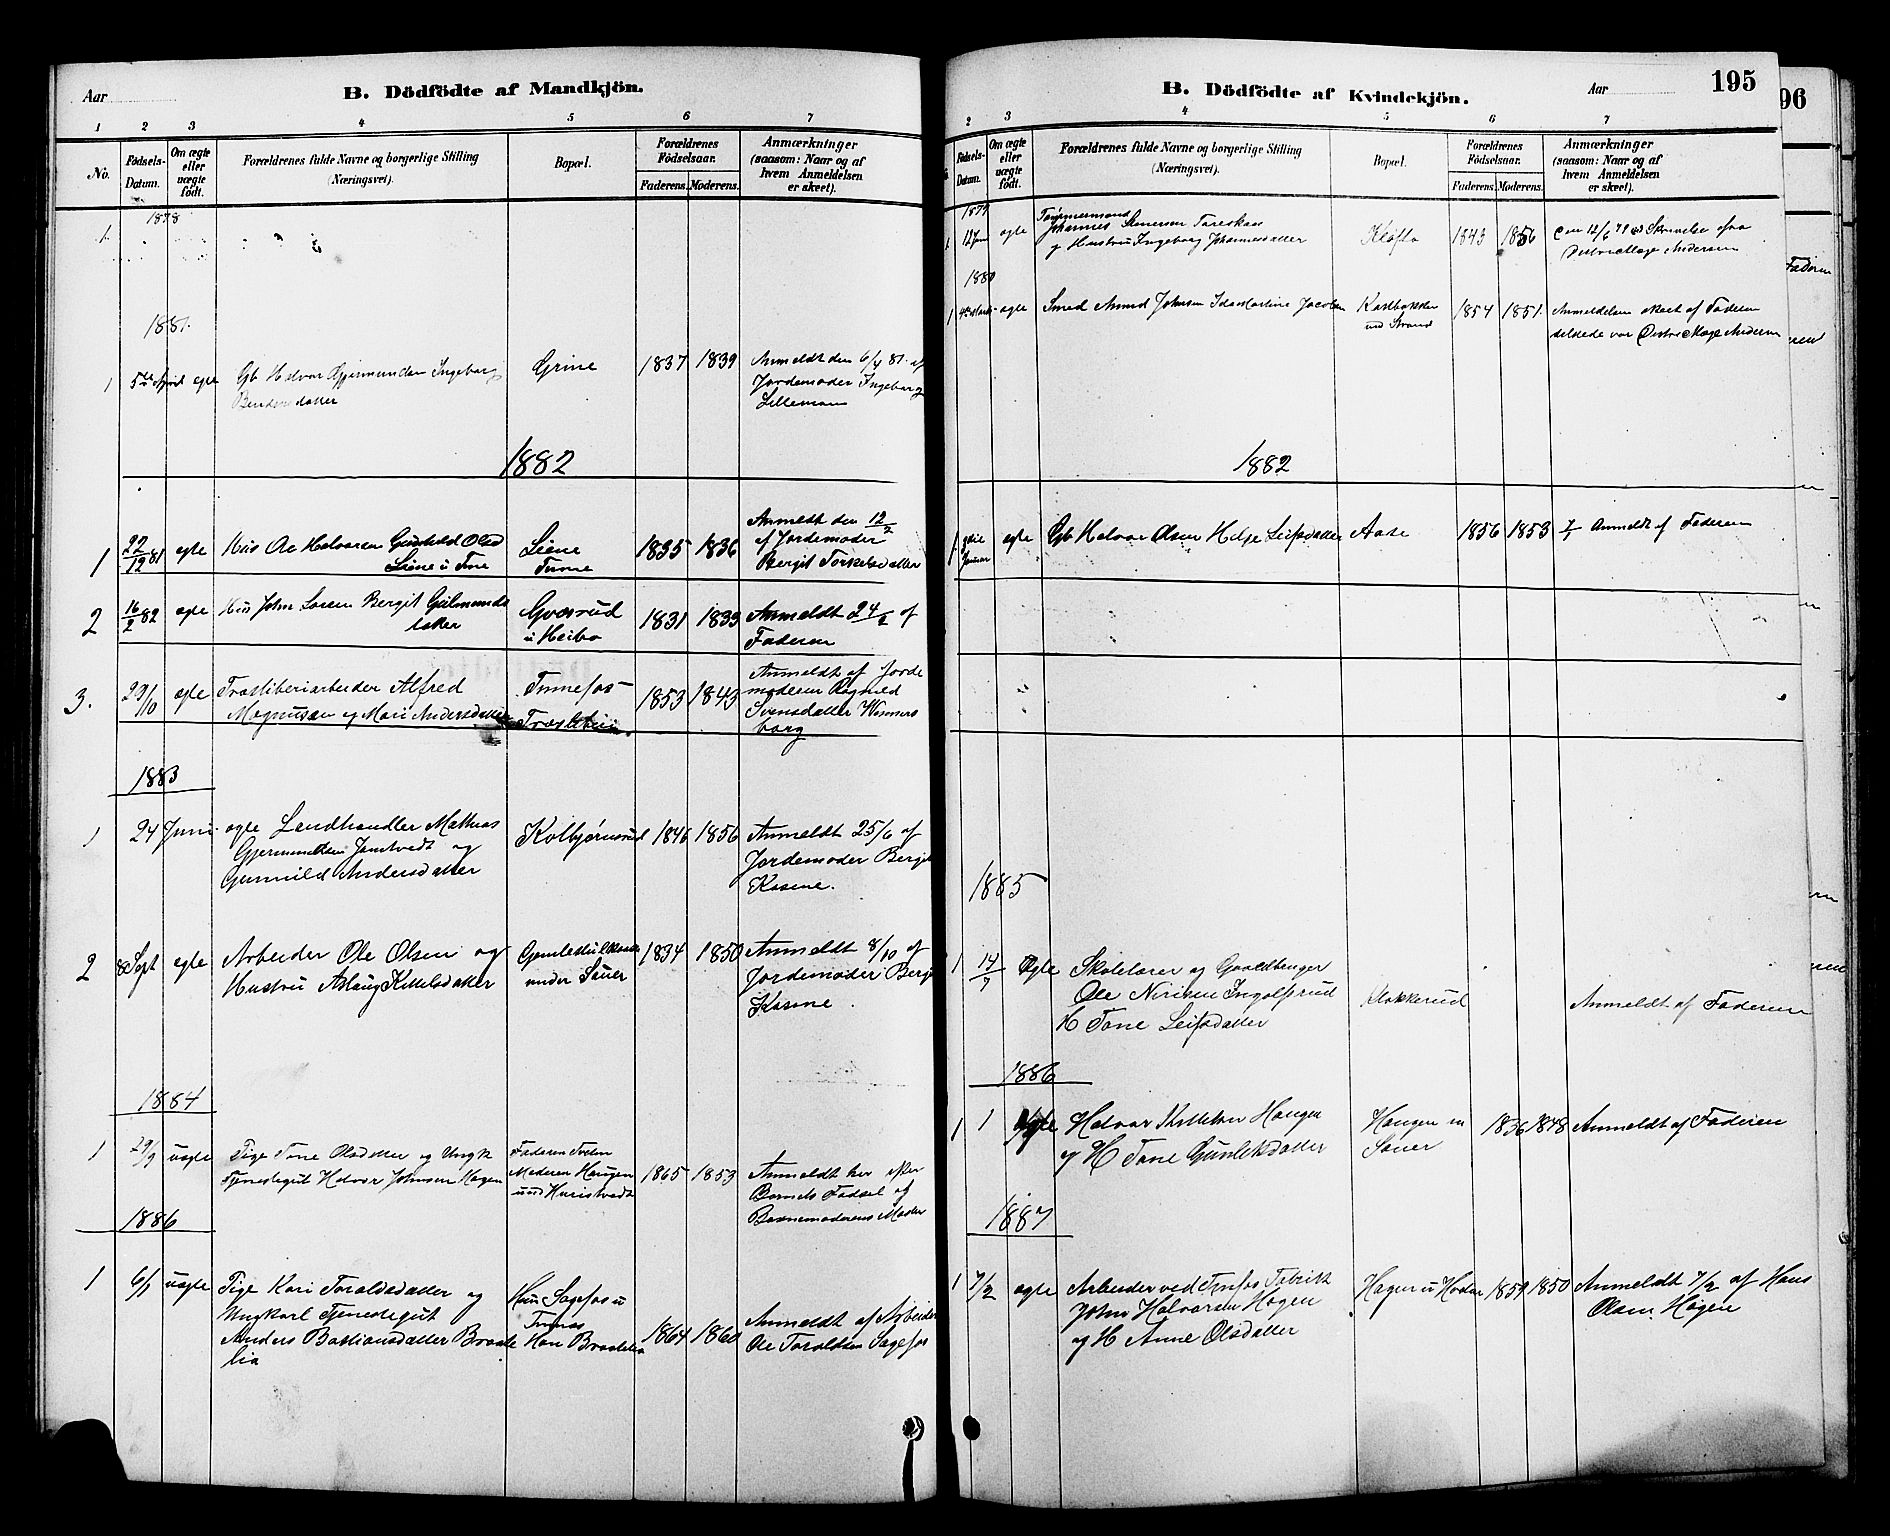 SAKO, Heddal kirkebøker, G/Ga/L0002: Klokkerbok nr. I 2, 1879-1908, s. 195